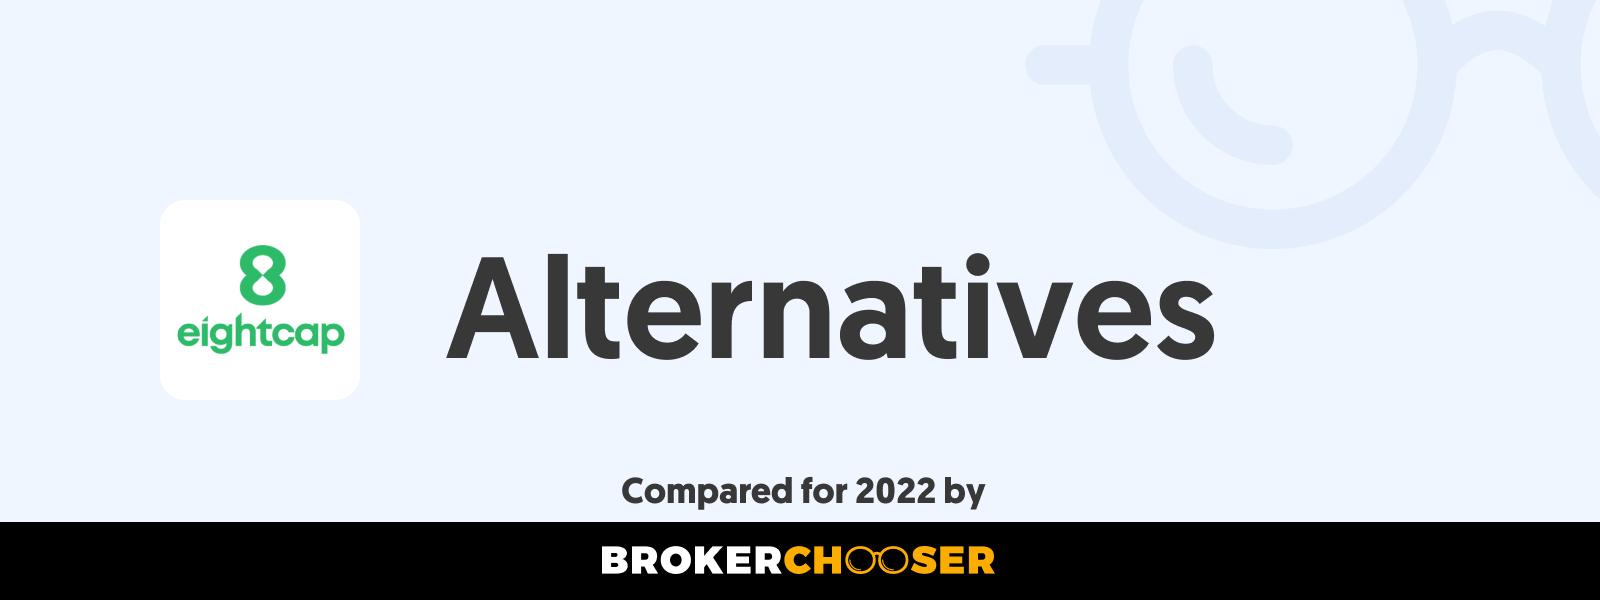 Eightcap Alternatives